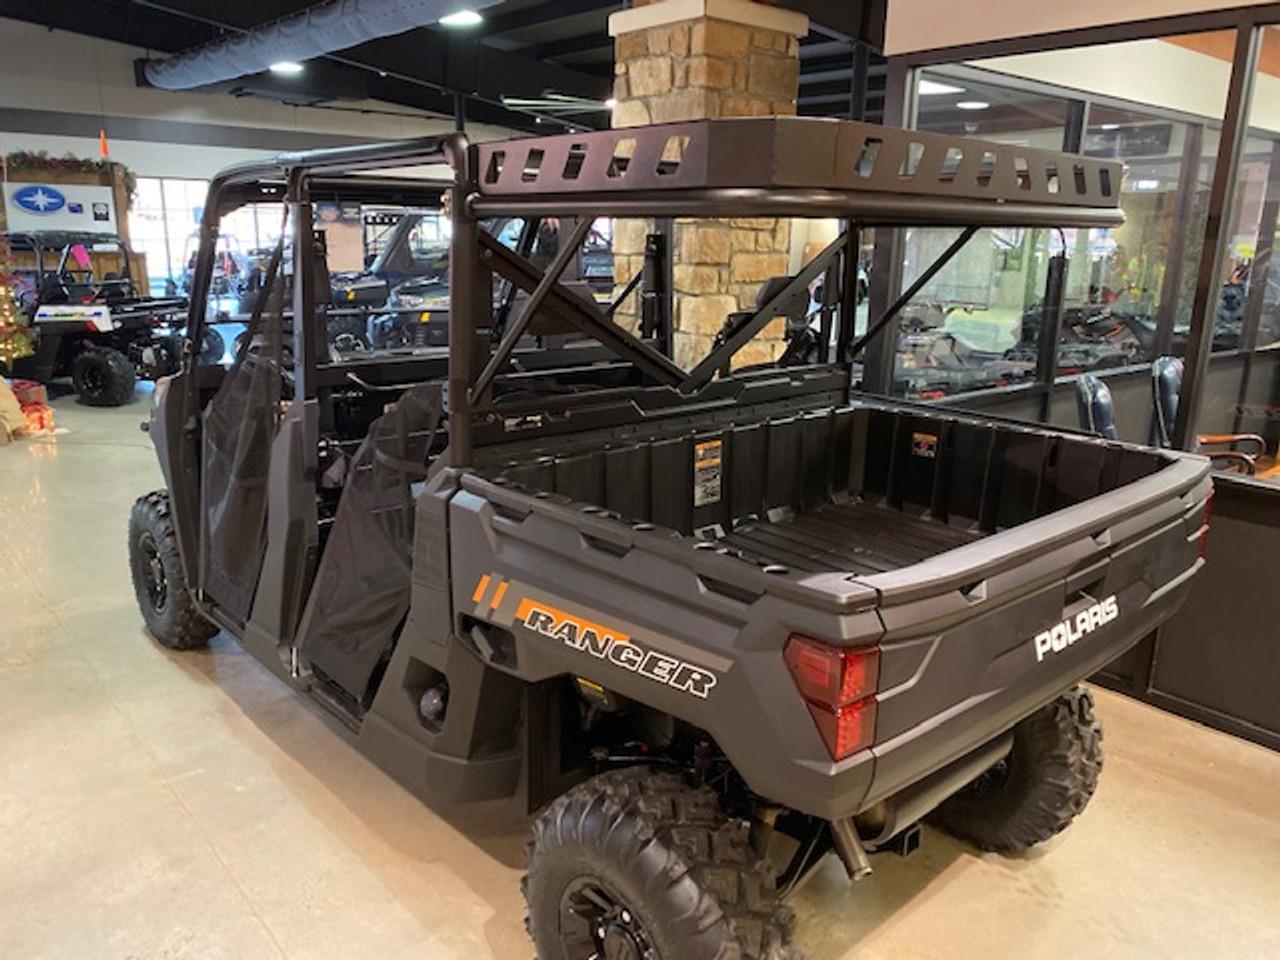 Ranger 1000 Rear Cargo Rack